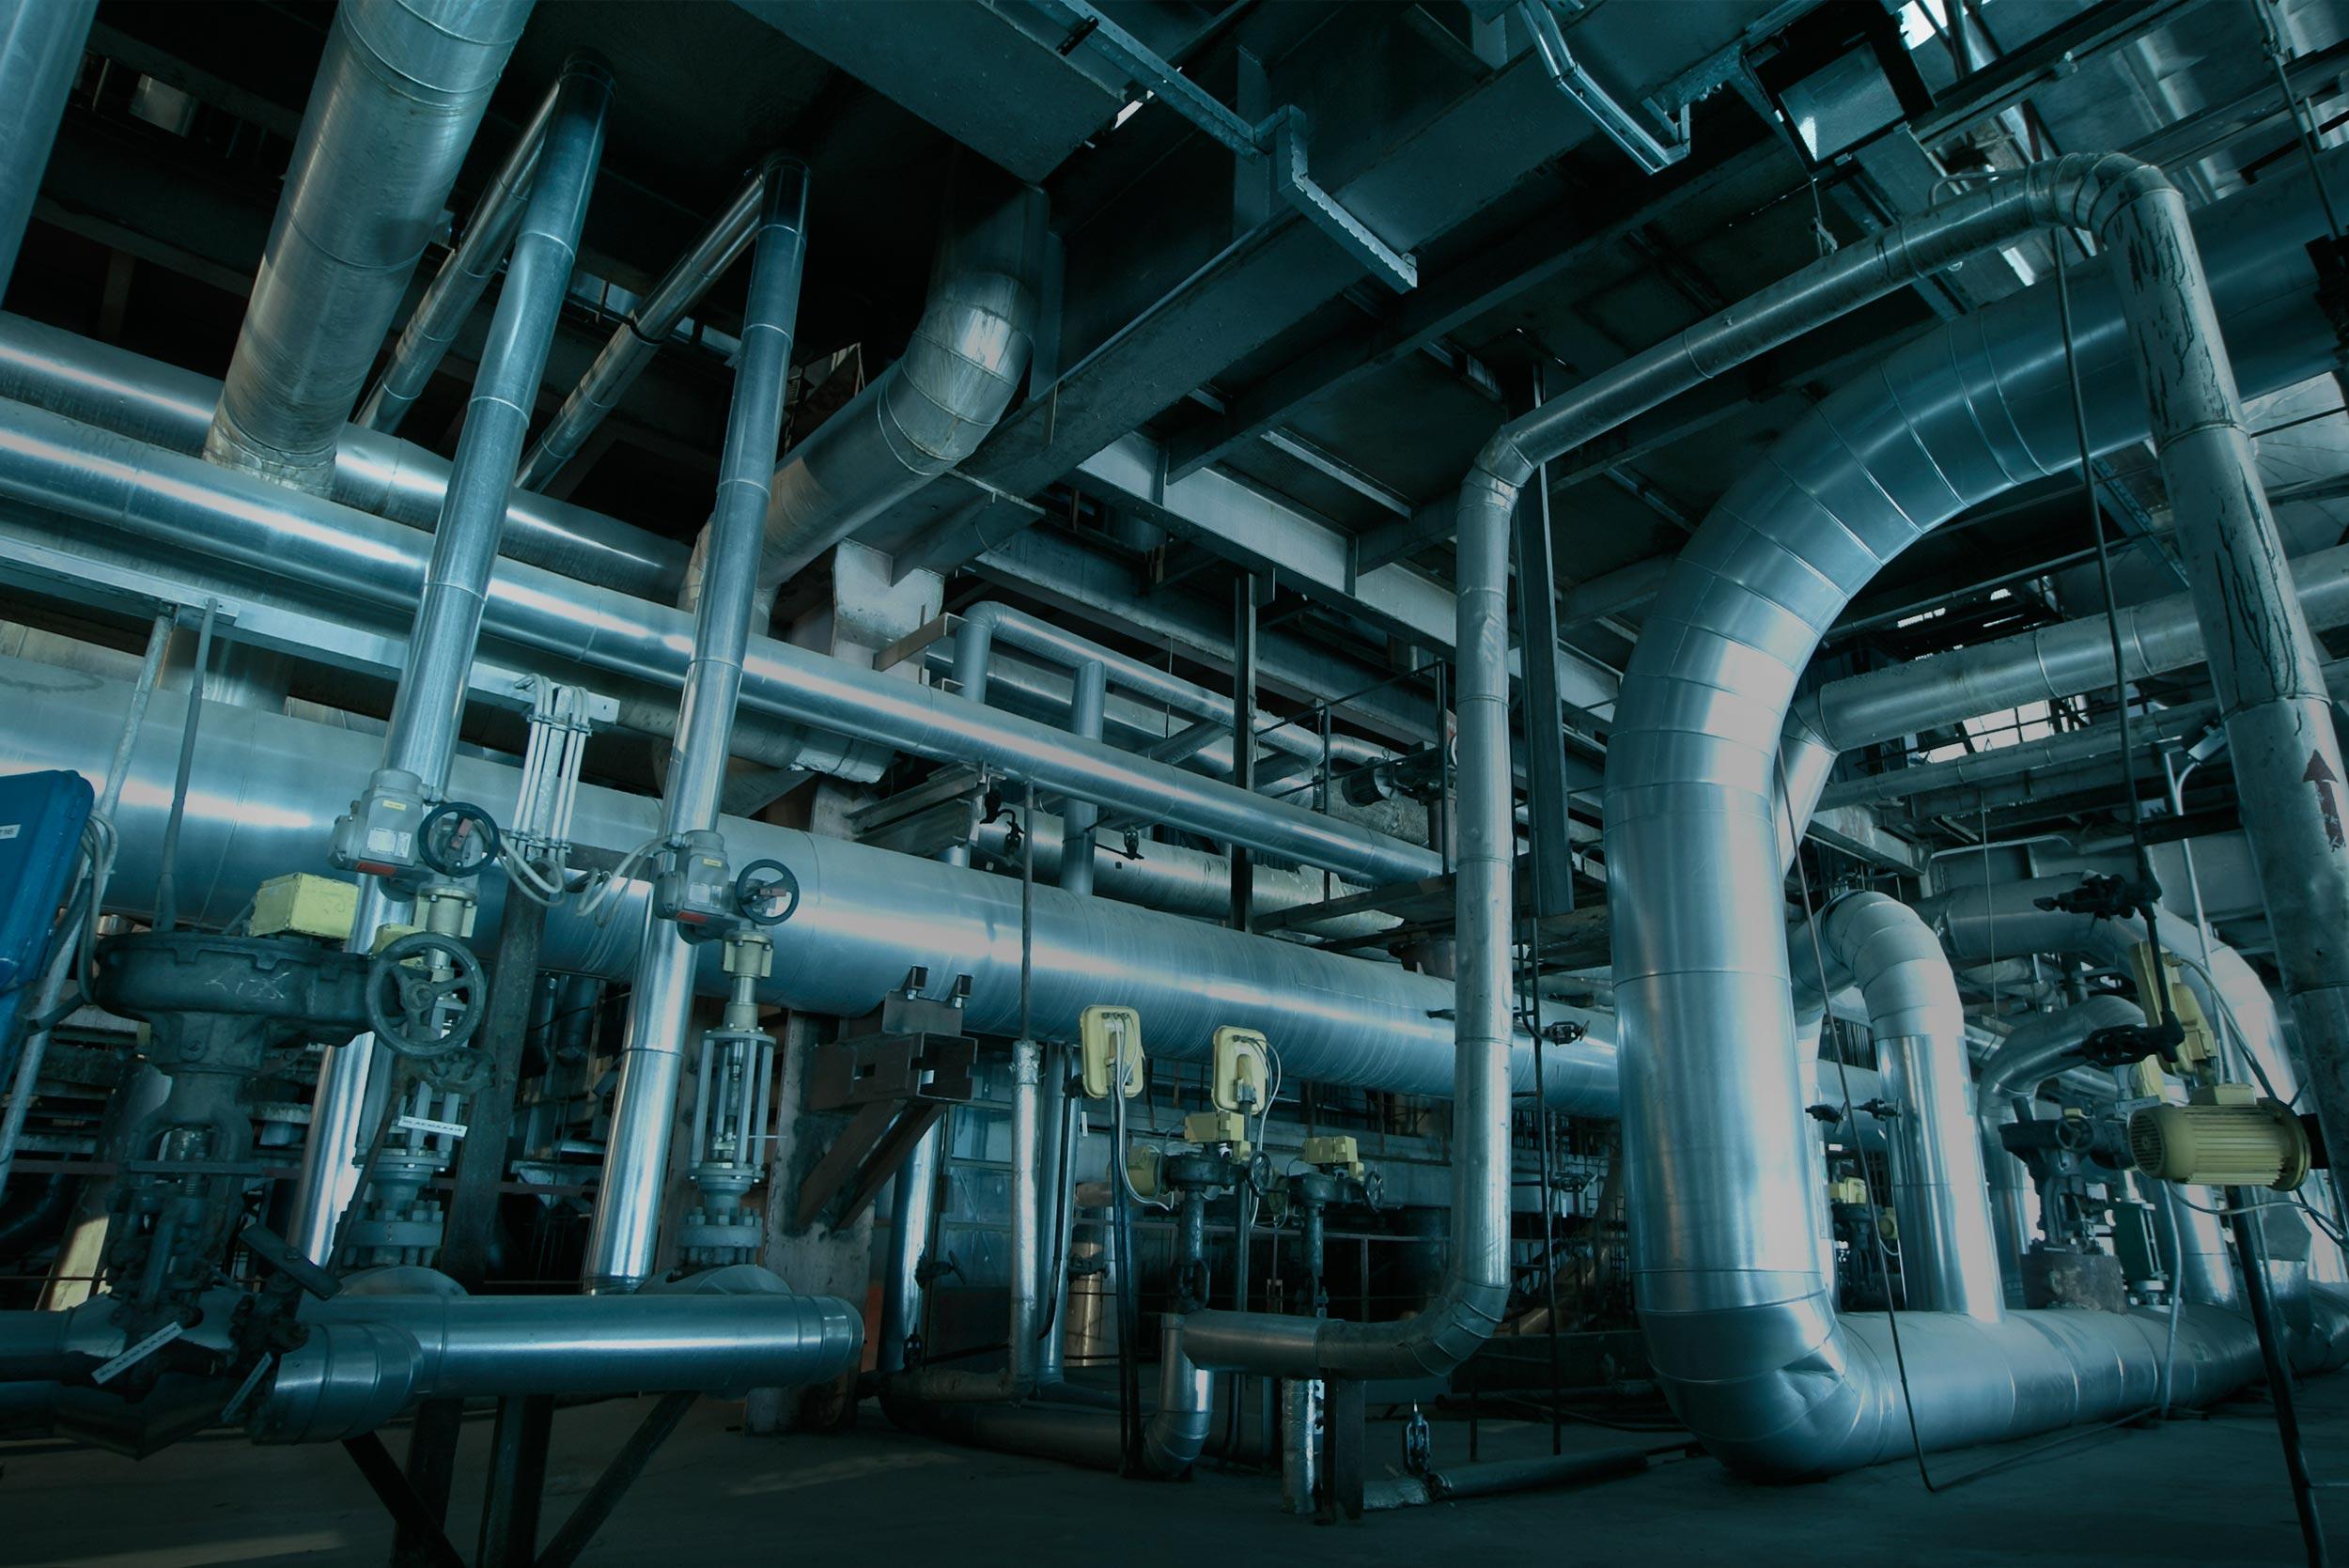 industrial-process.jpg